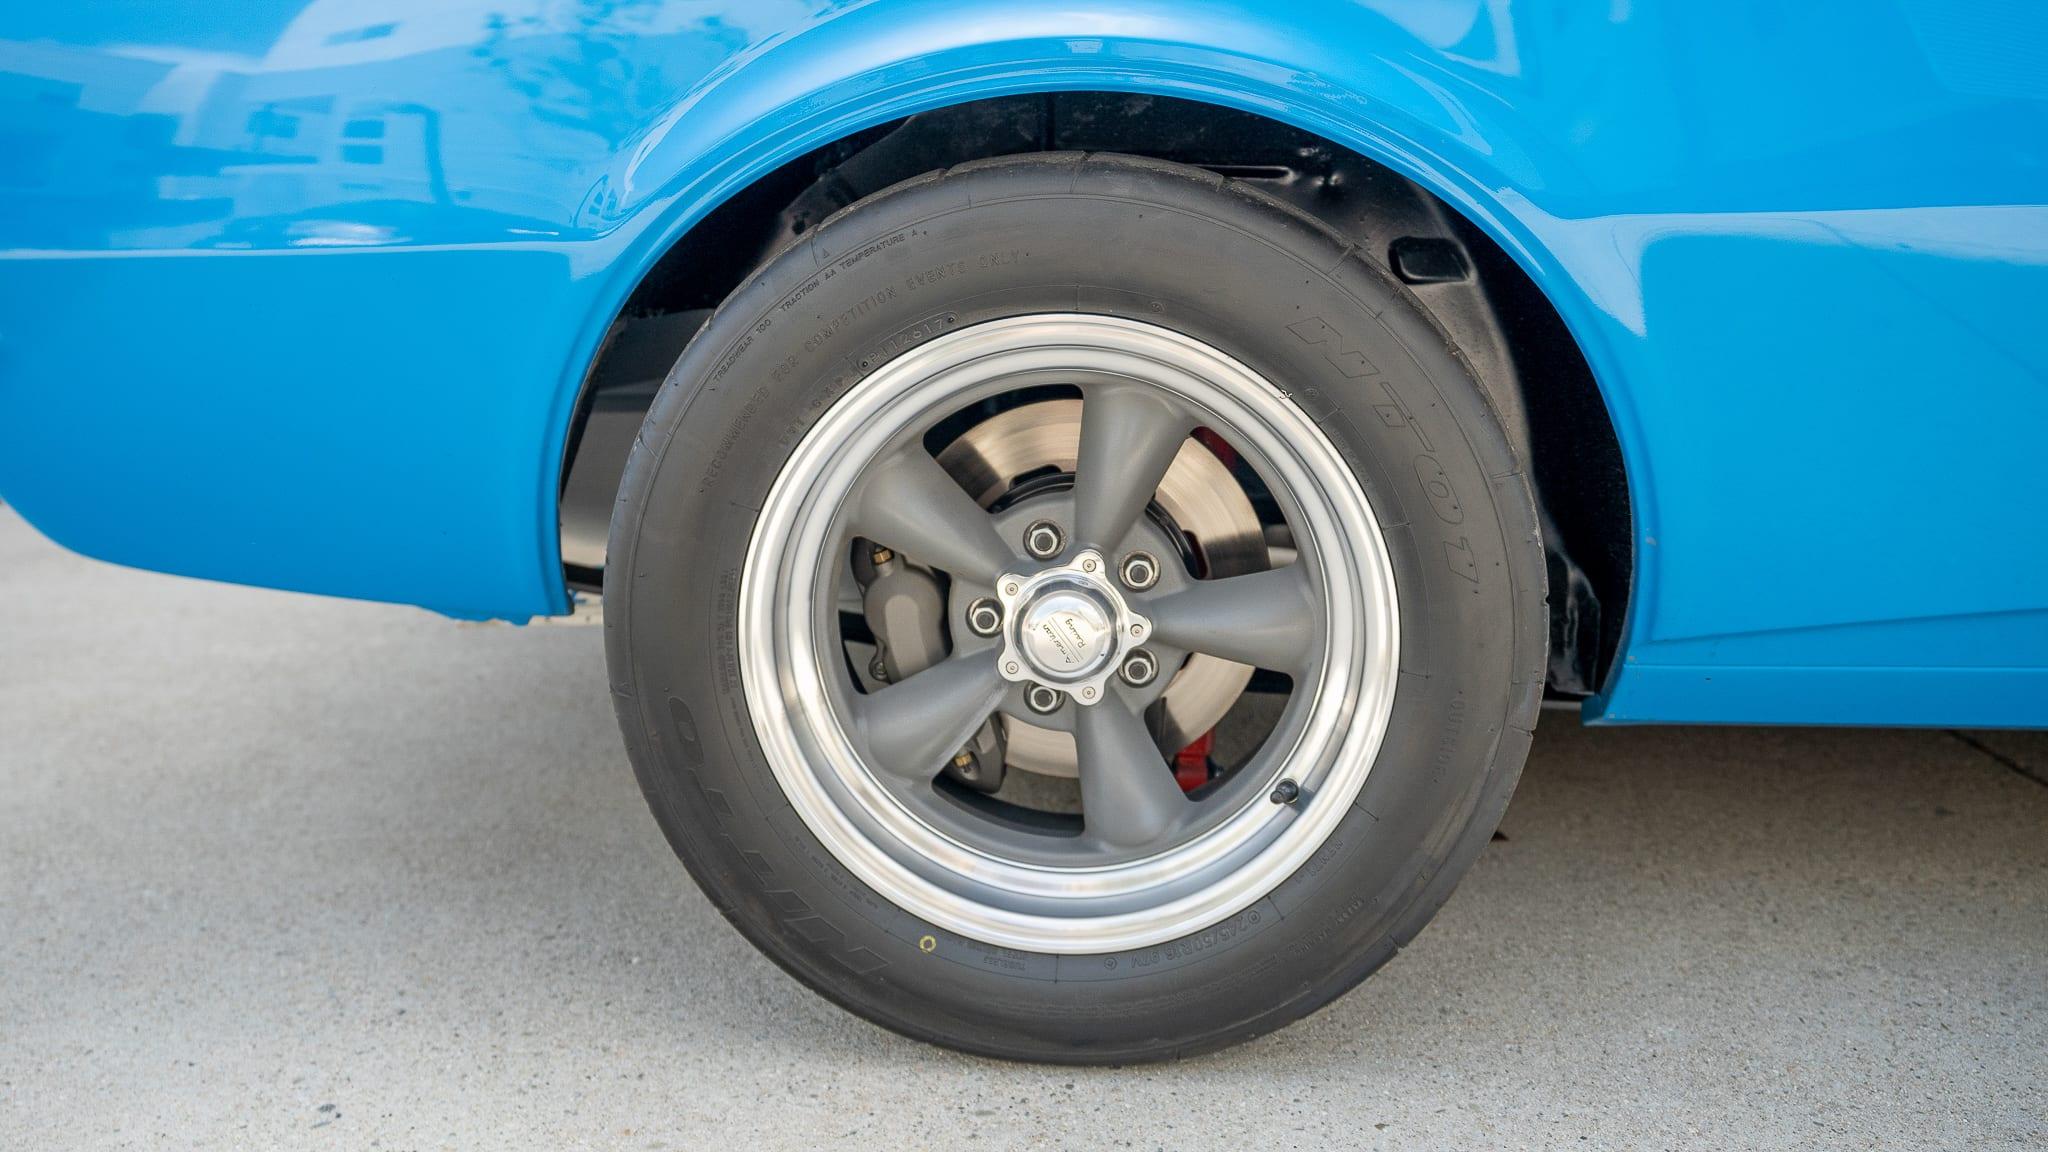 1967 Chevrolet Camaro - Ferraris Online